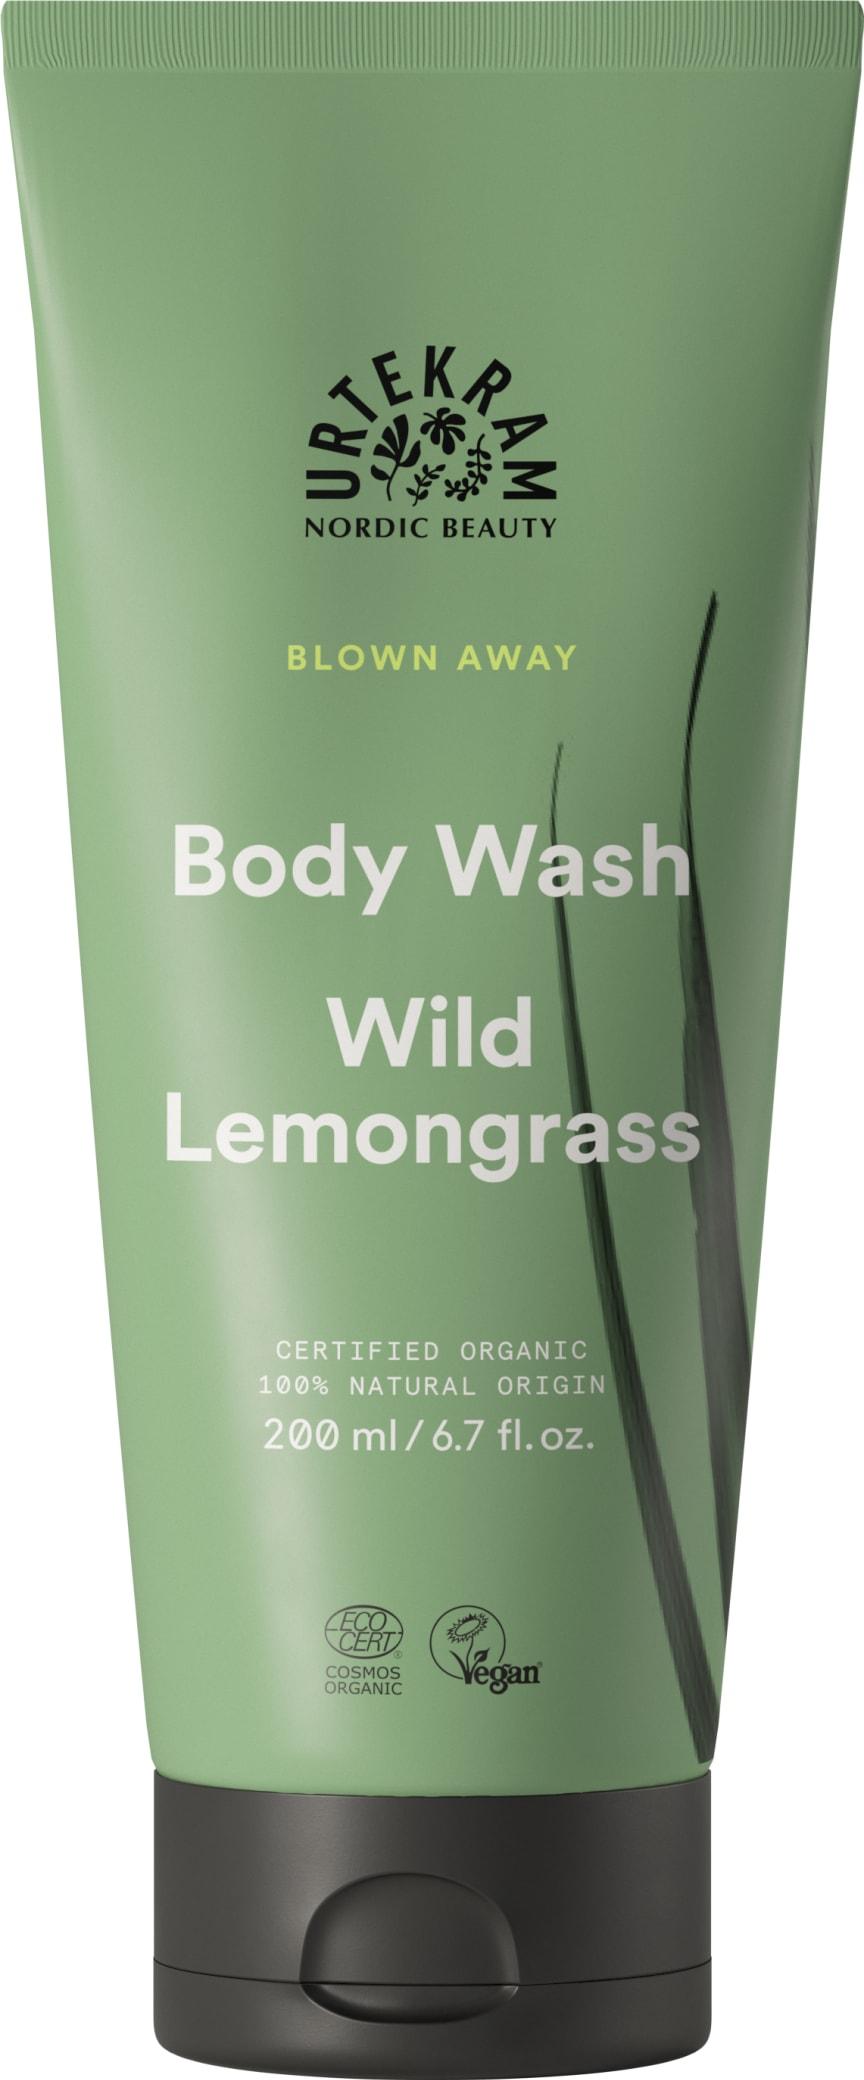 BLOWN AWAY Body Wash